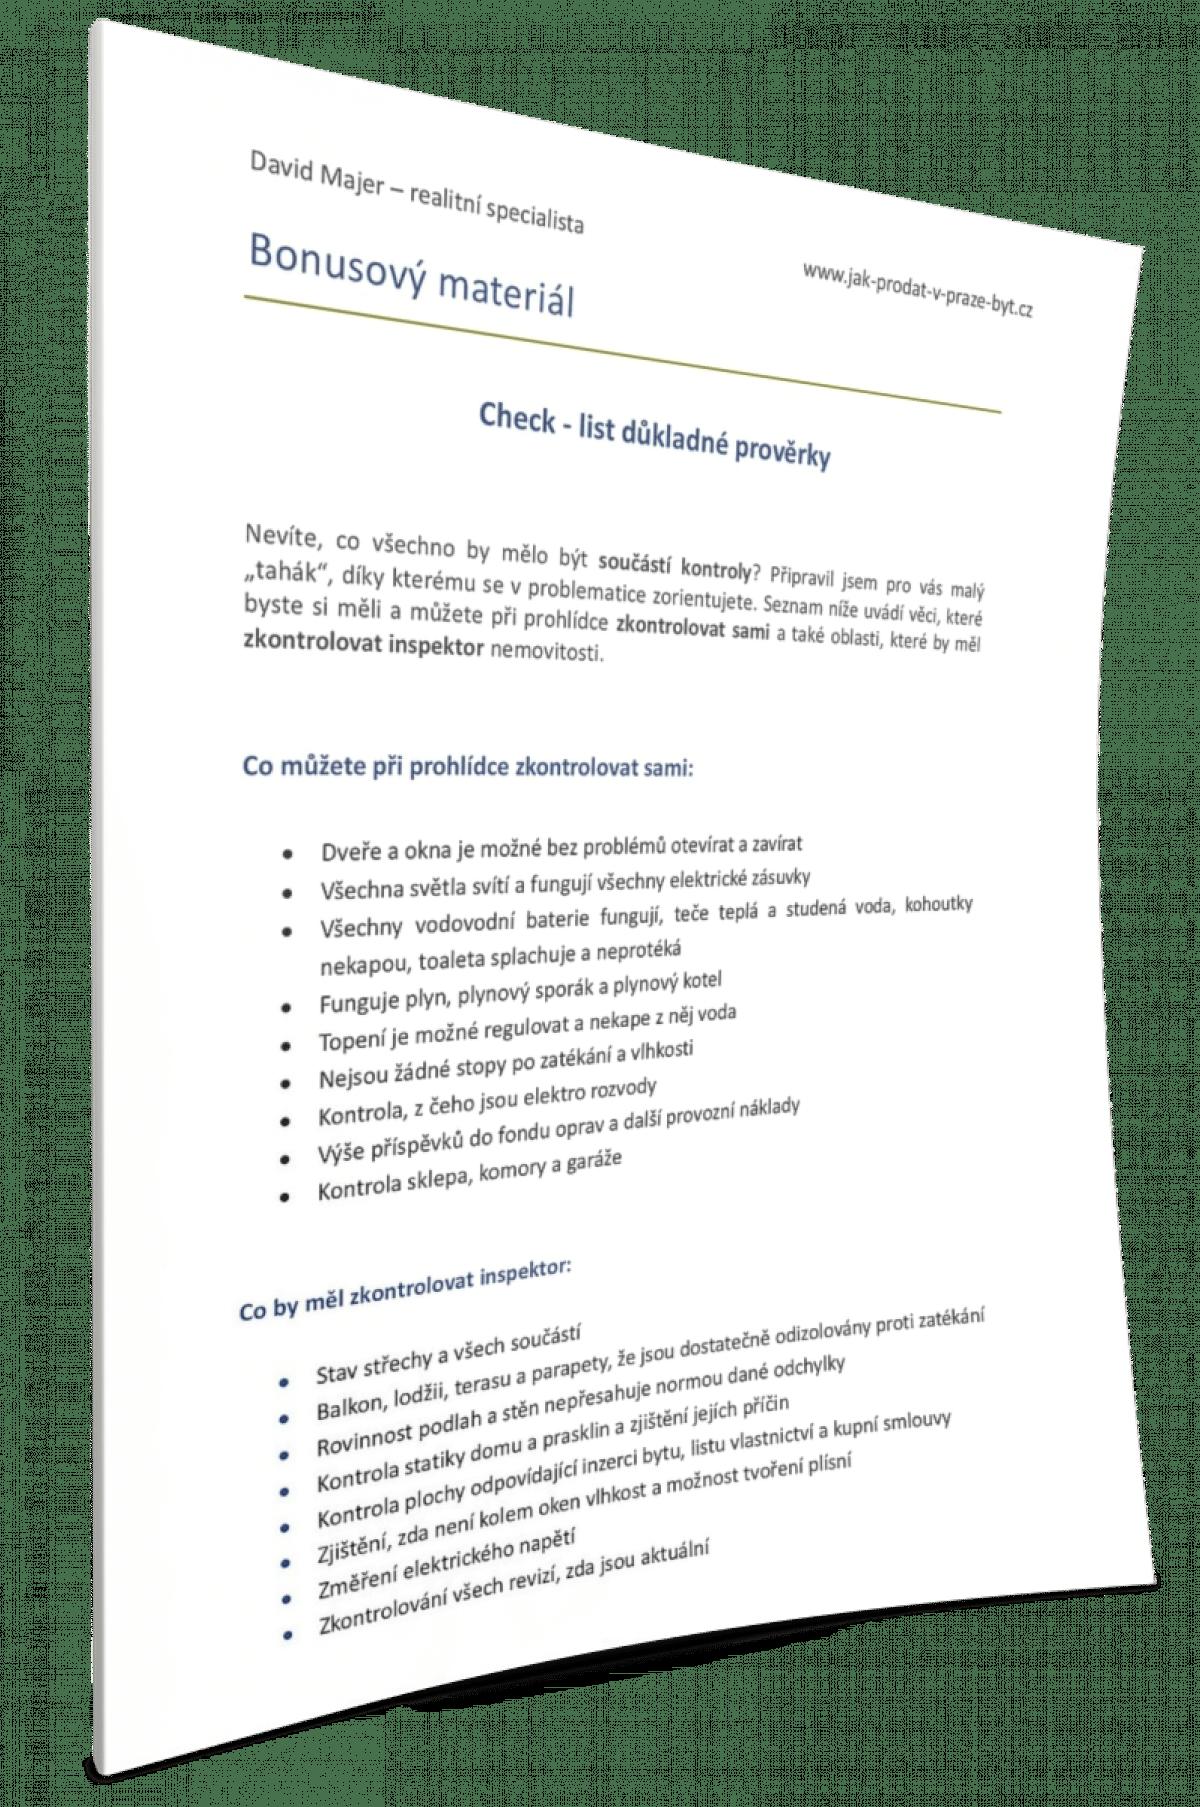 Check list inspekce nemovitostí